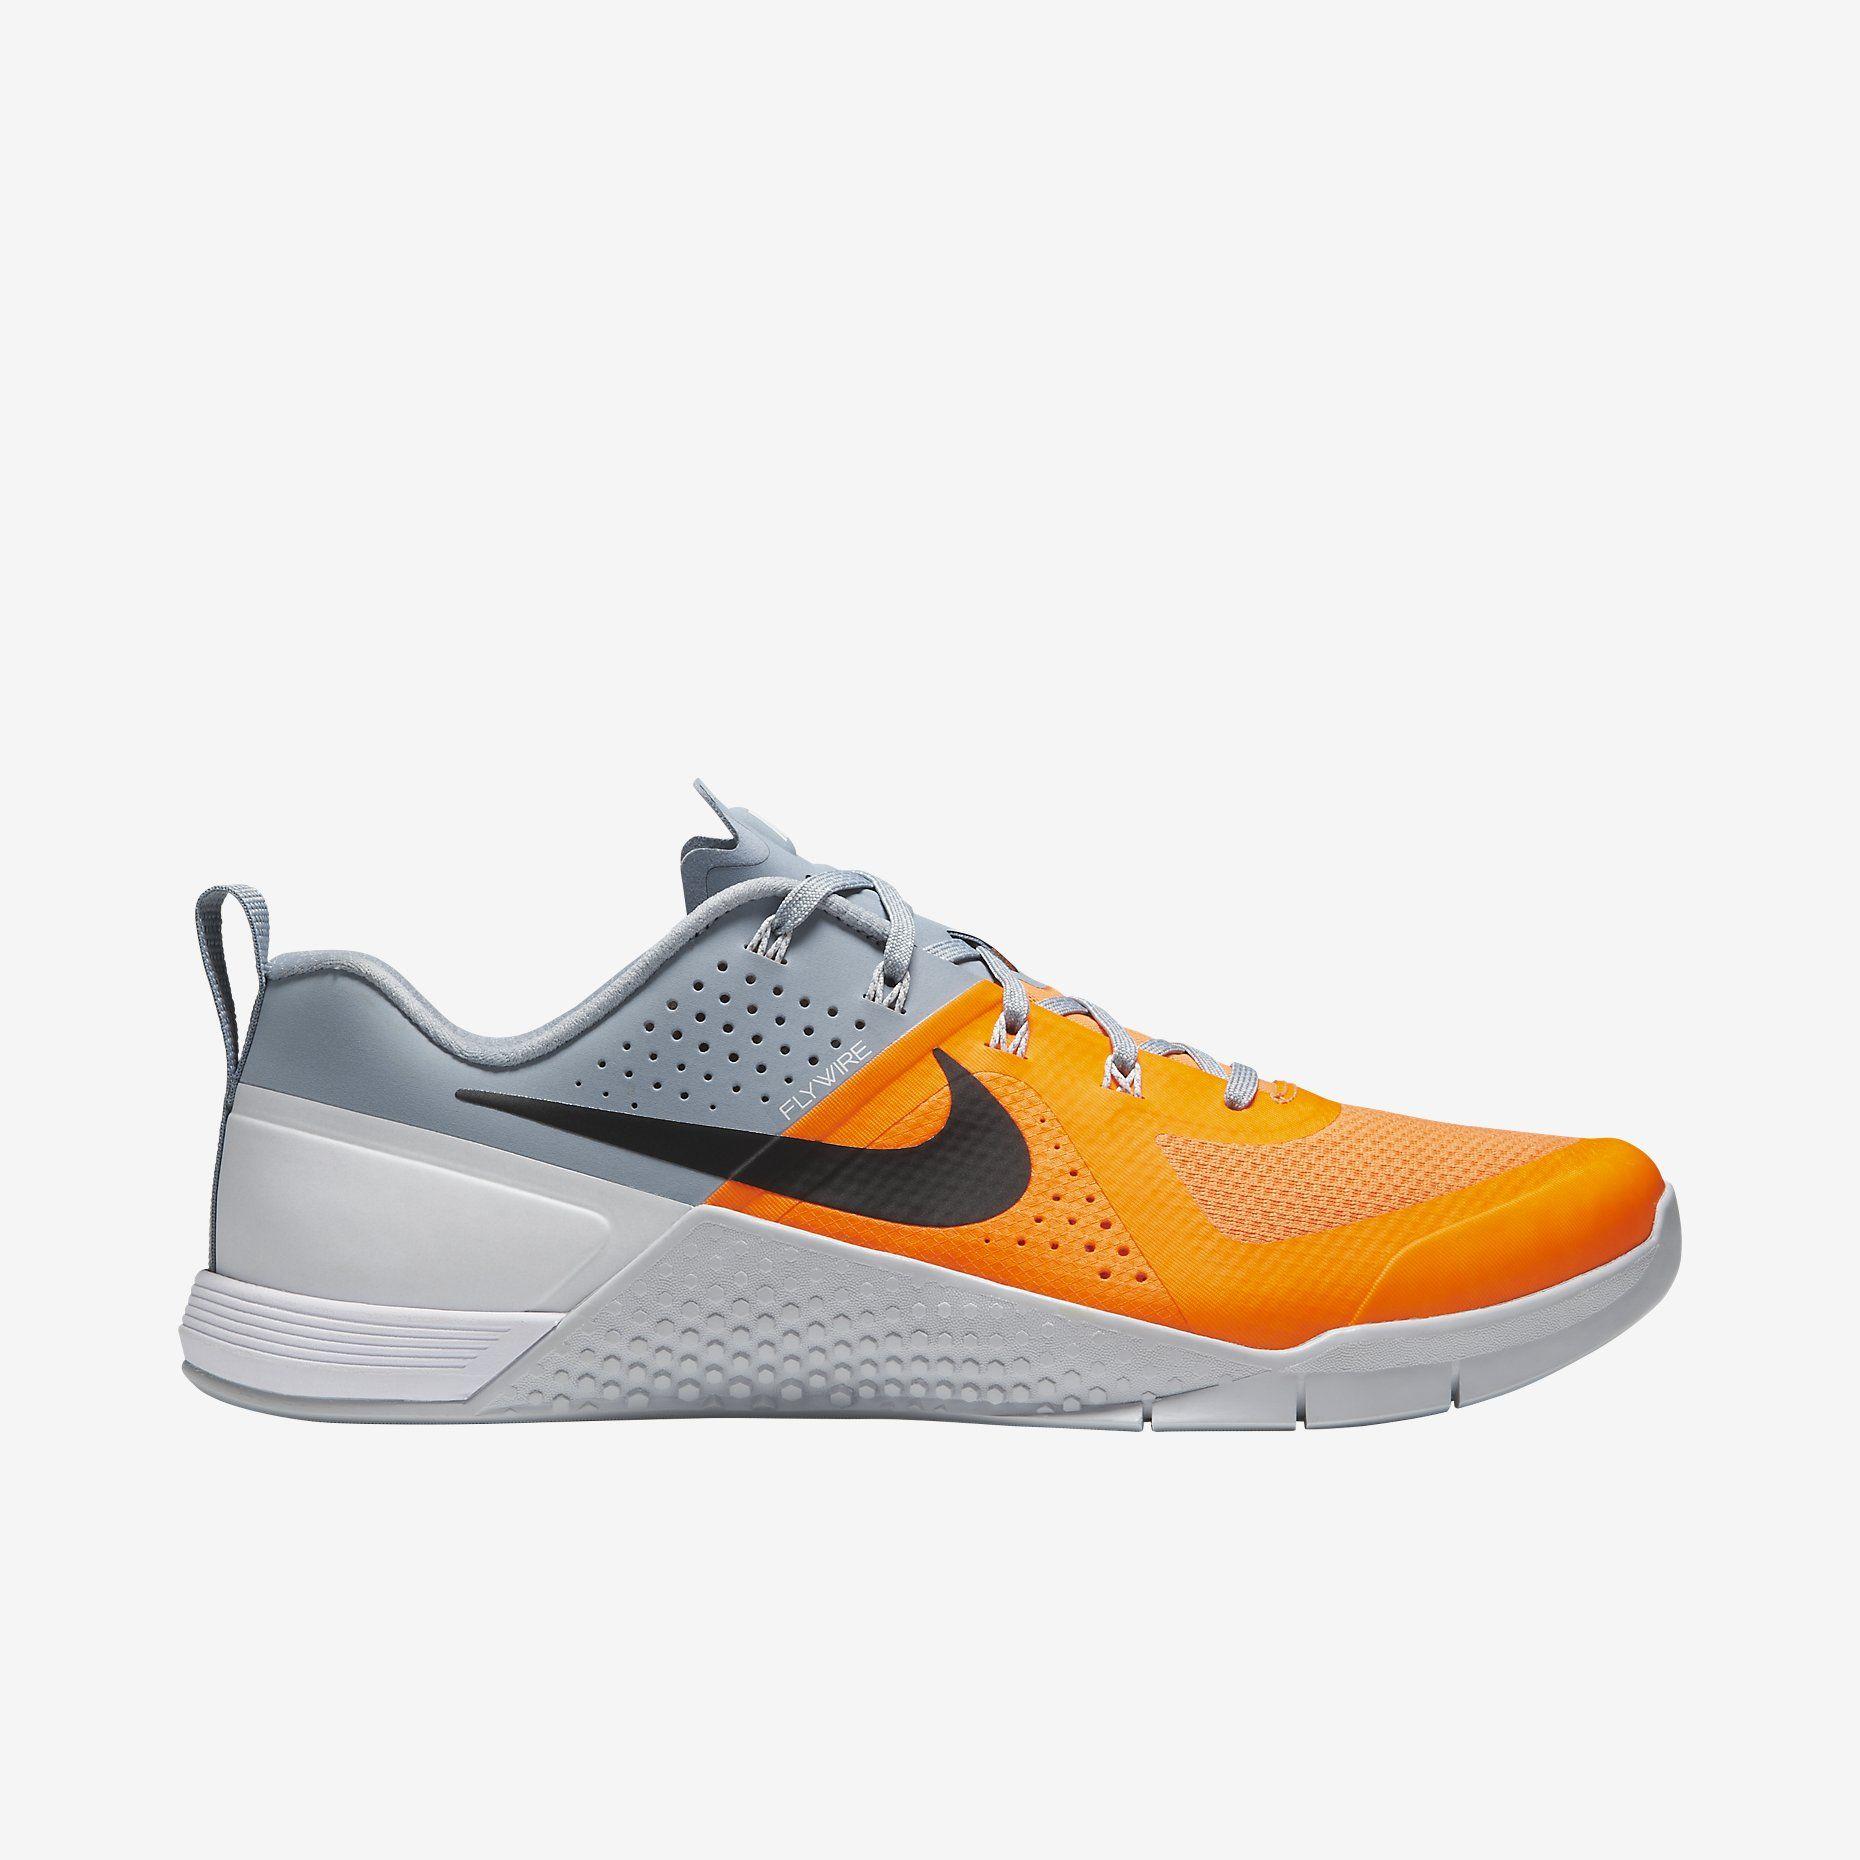 Cross Trainings und Fitnessstudio Schuhe für Herren. Nike